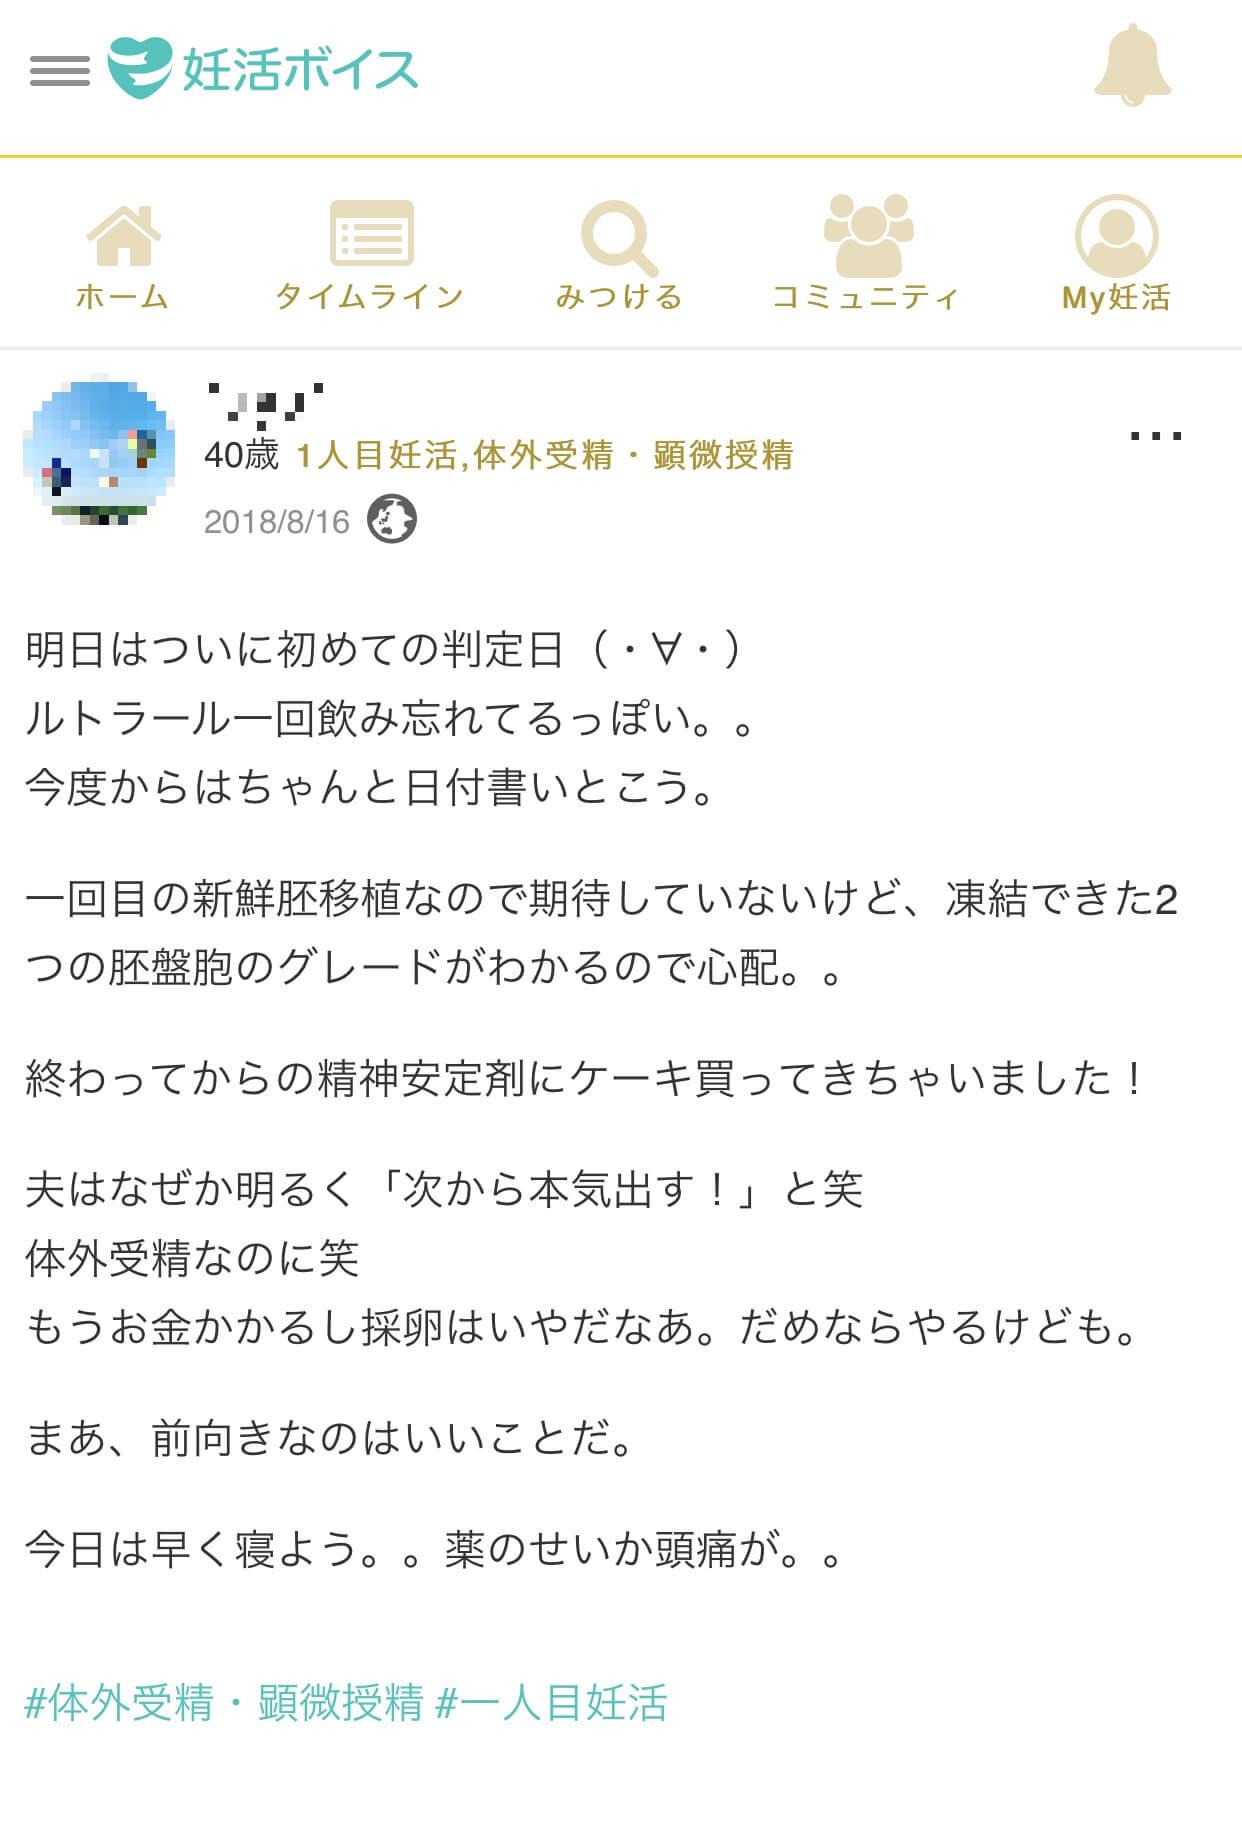 aさん(40歳・1人目妊活・体外受精・顕微授精)